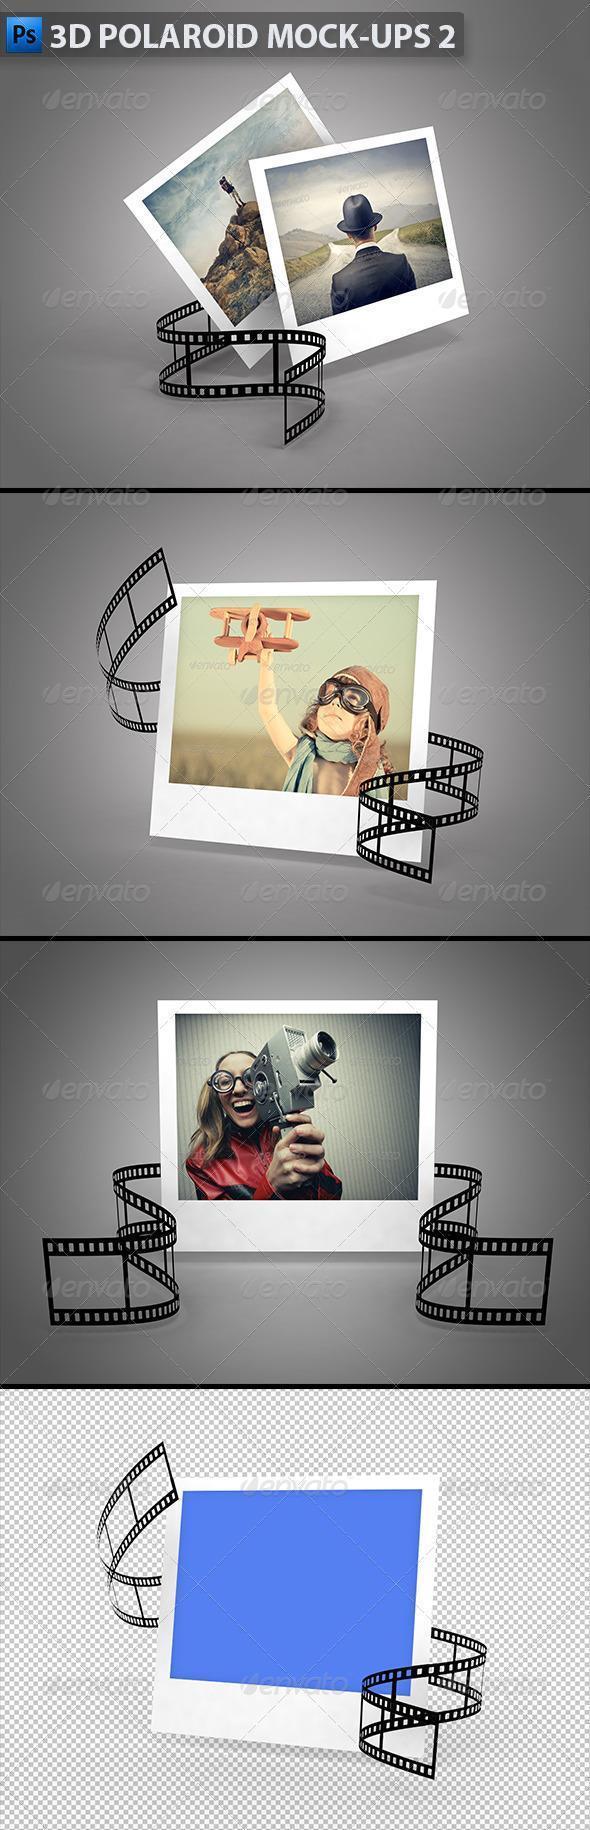 Polaroid Photoshop Template